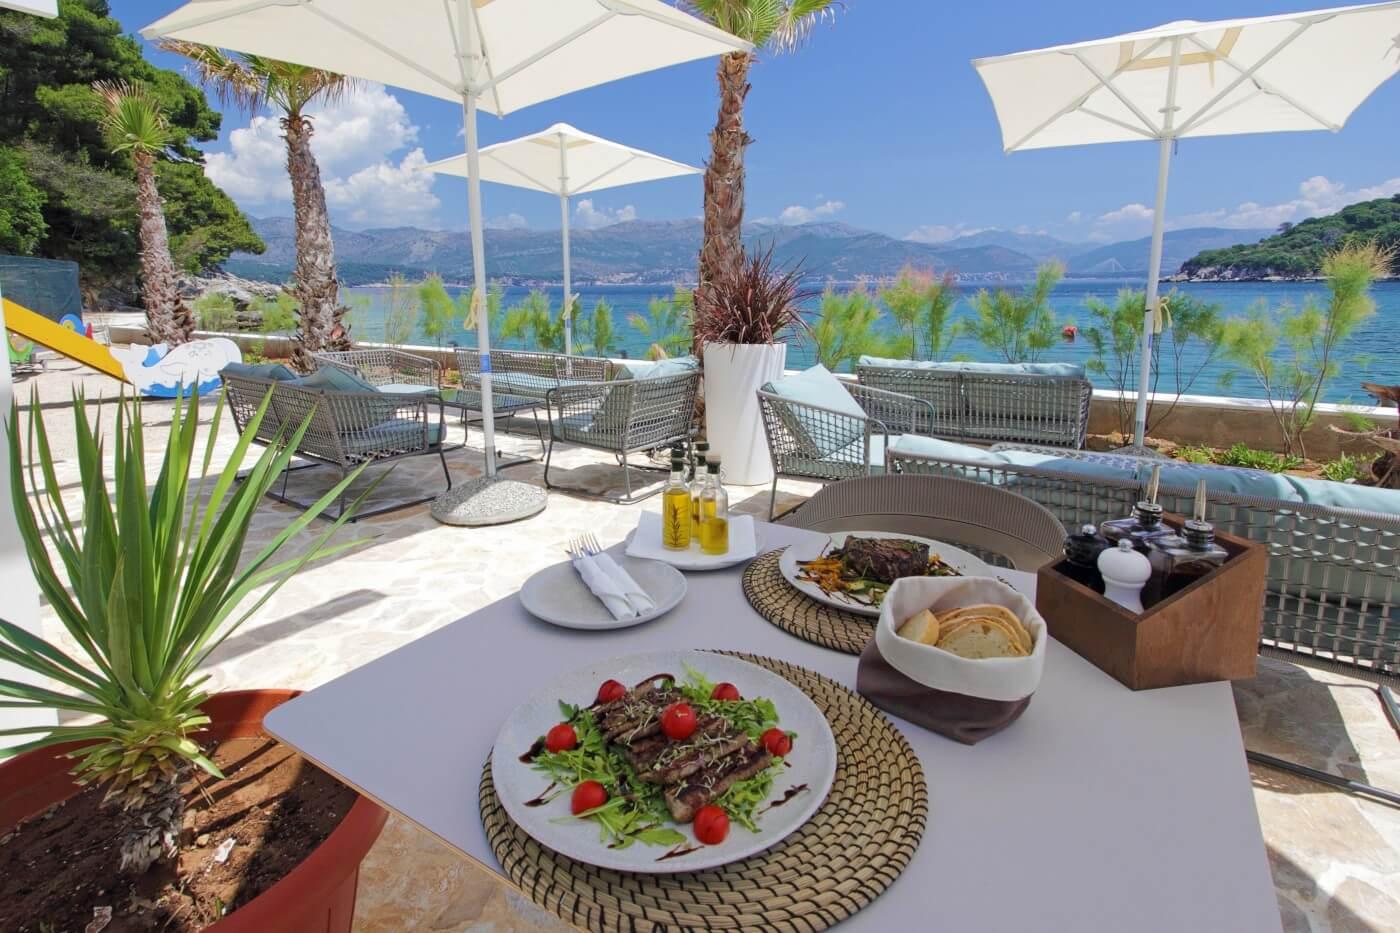 Seaside restaurant terrace on Kolocep Island